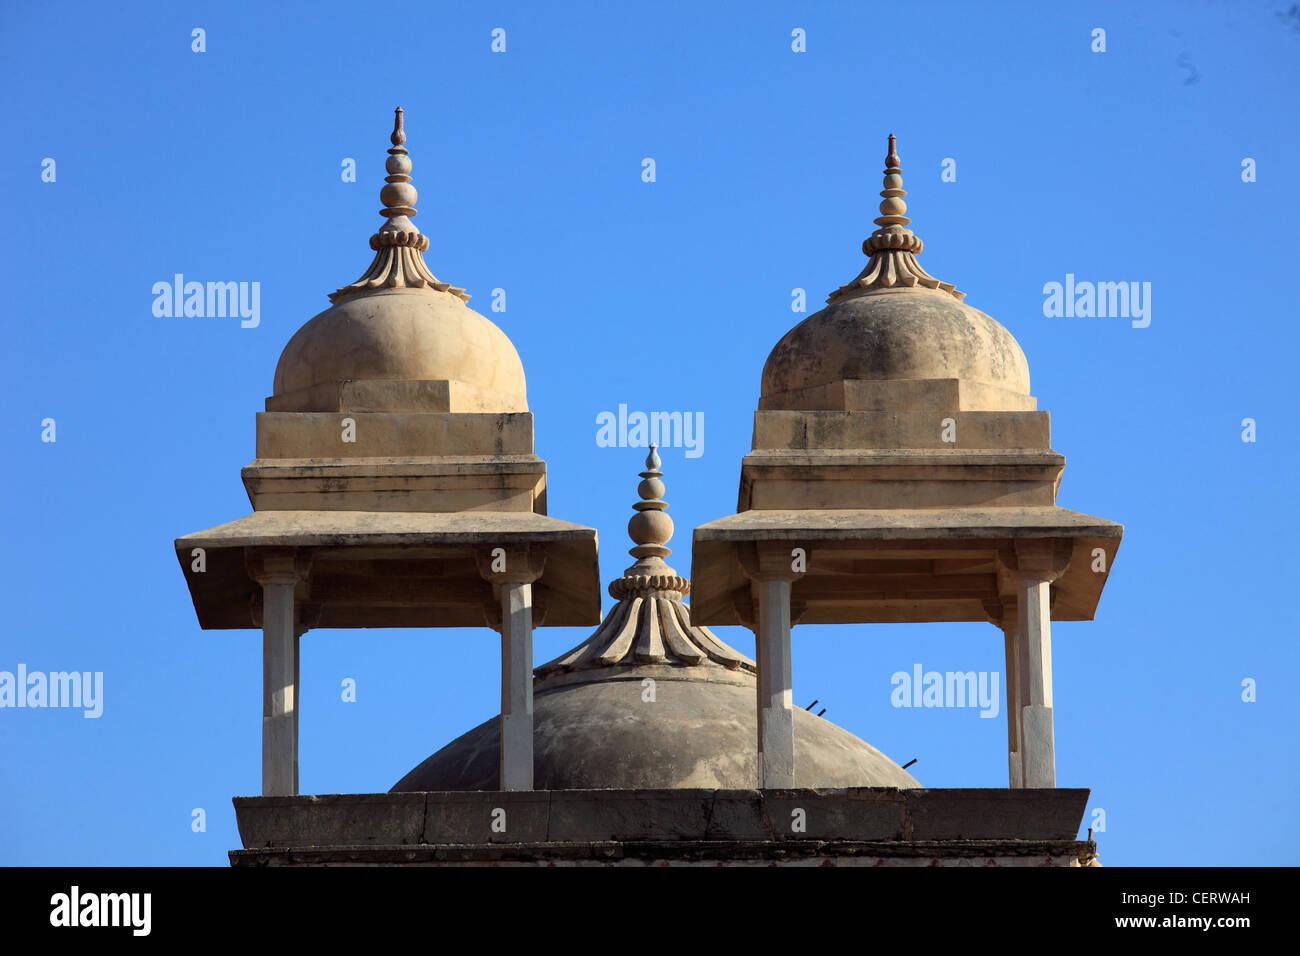 India, Rajasthan, Jaipur, Amber, Fort, towers, cupolas, - Stock Image